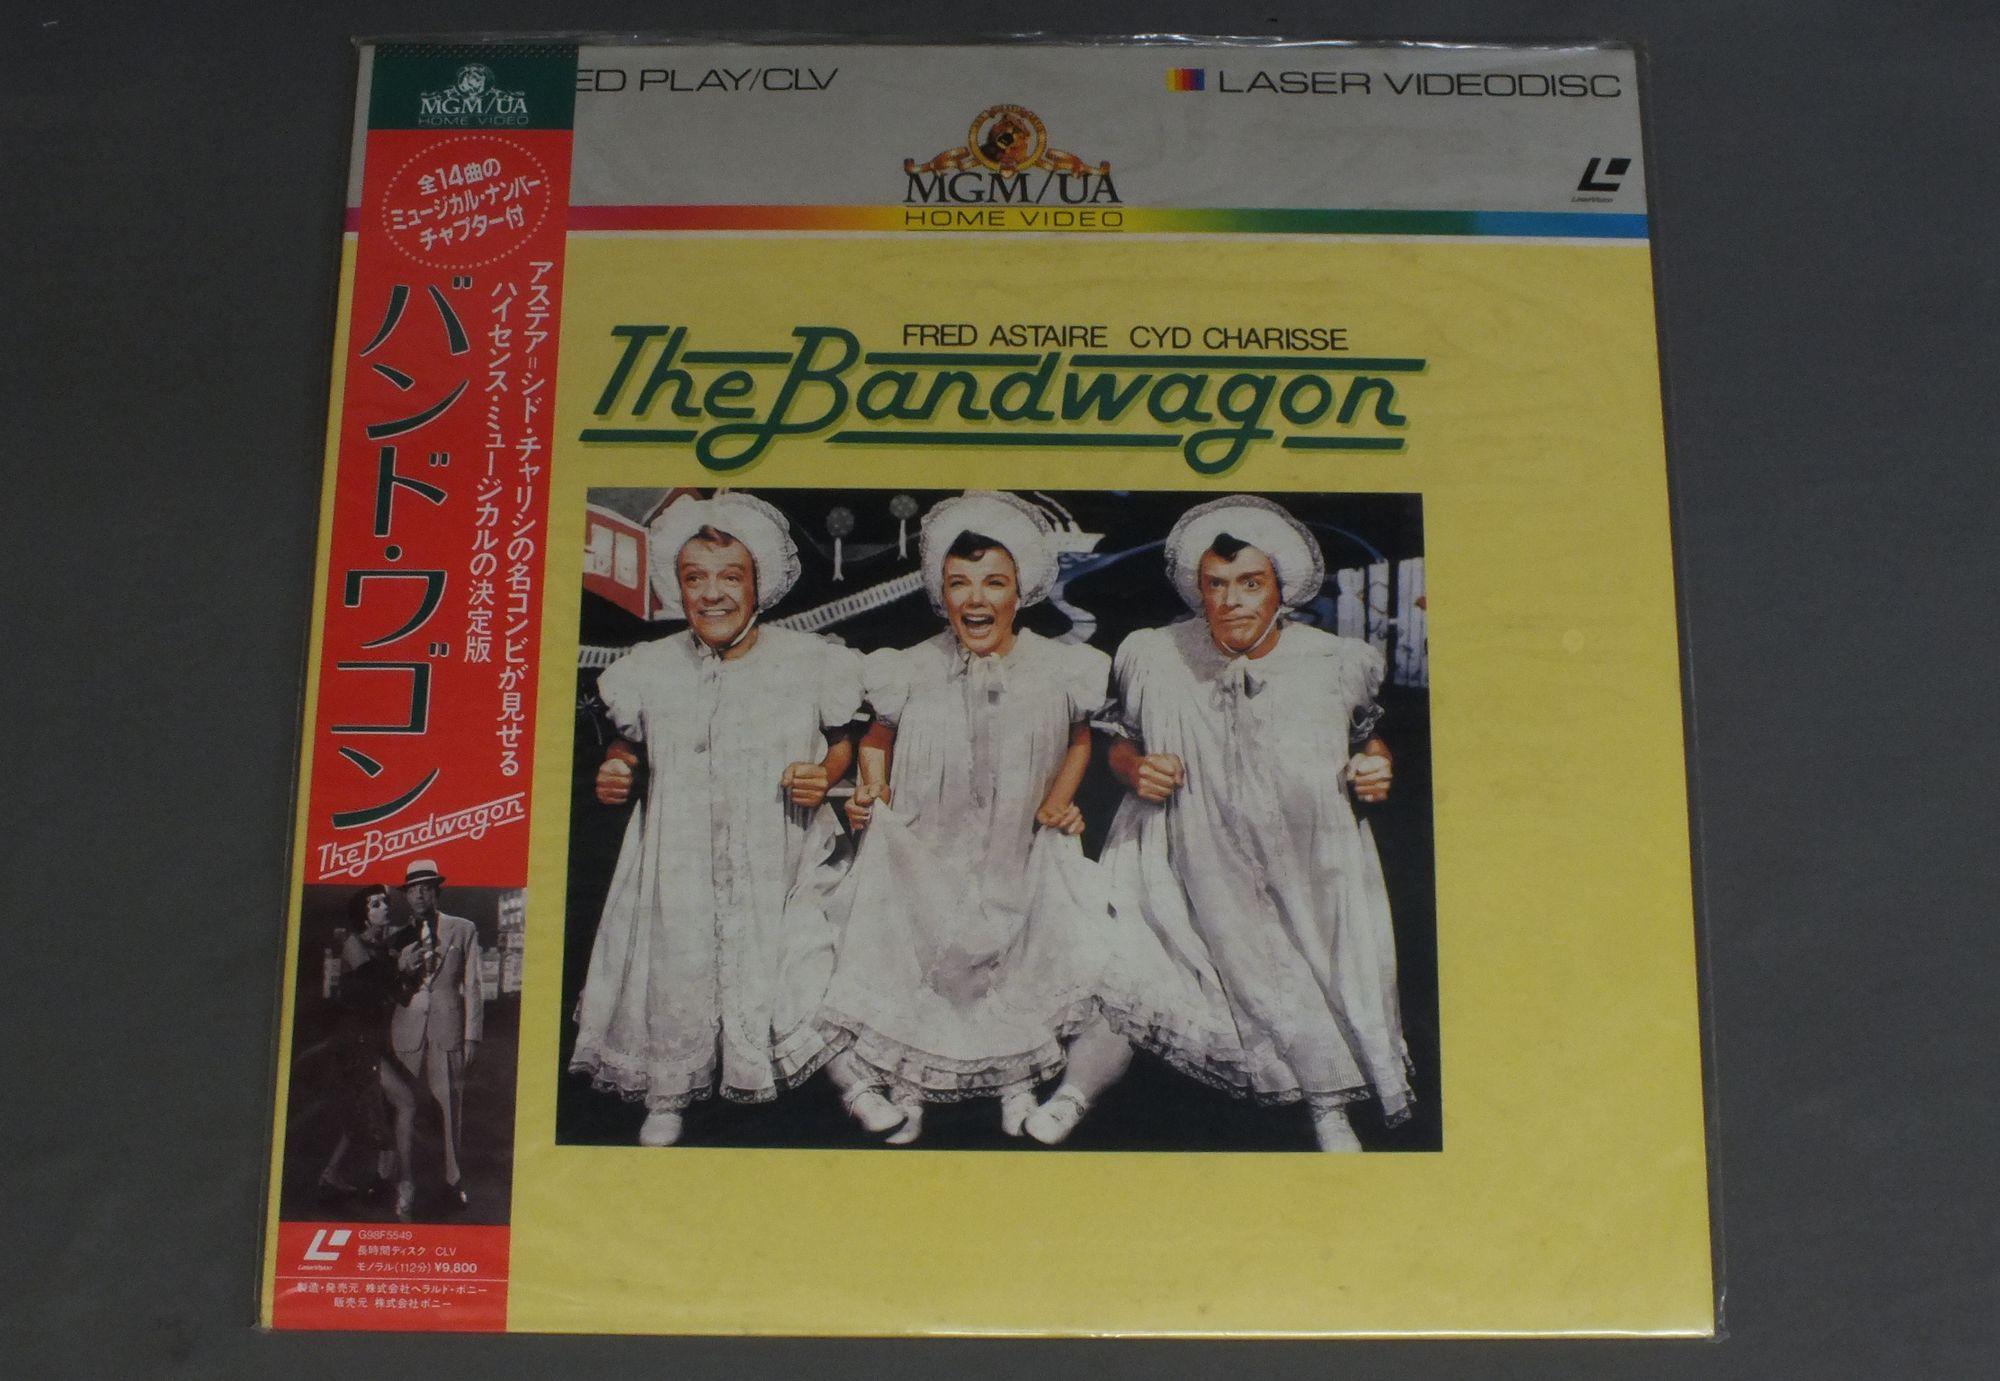 VINCENTE MINNELLI - BAND WAGON - Laser Disc